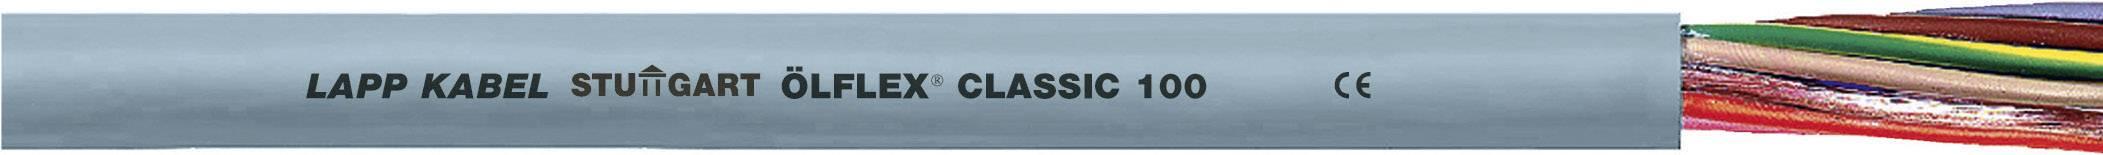 Kabel LappKabel Ölflex CLASSIC 100 3X2,5 (00100933), PVC, 9,6 mm, 750 V, šedá, 100 m